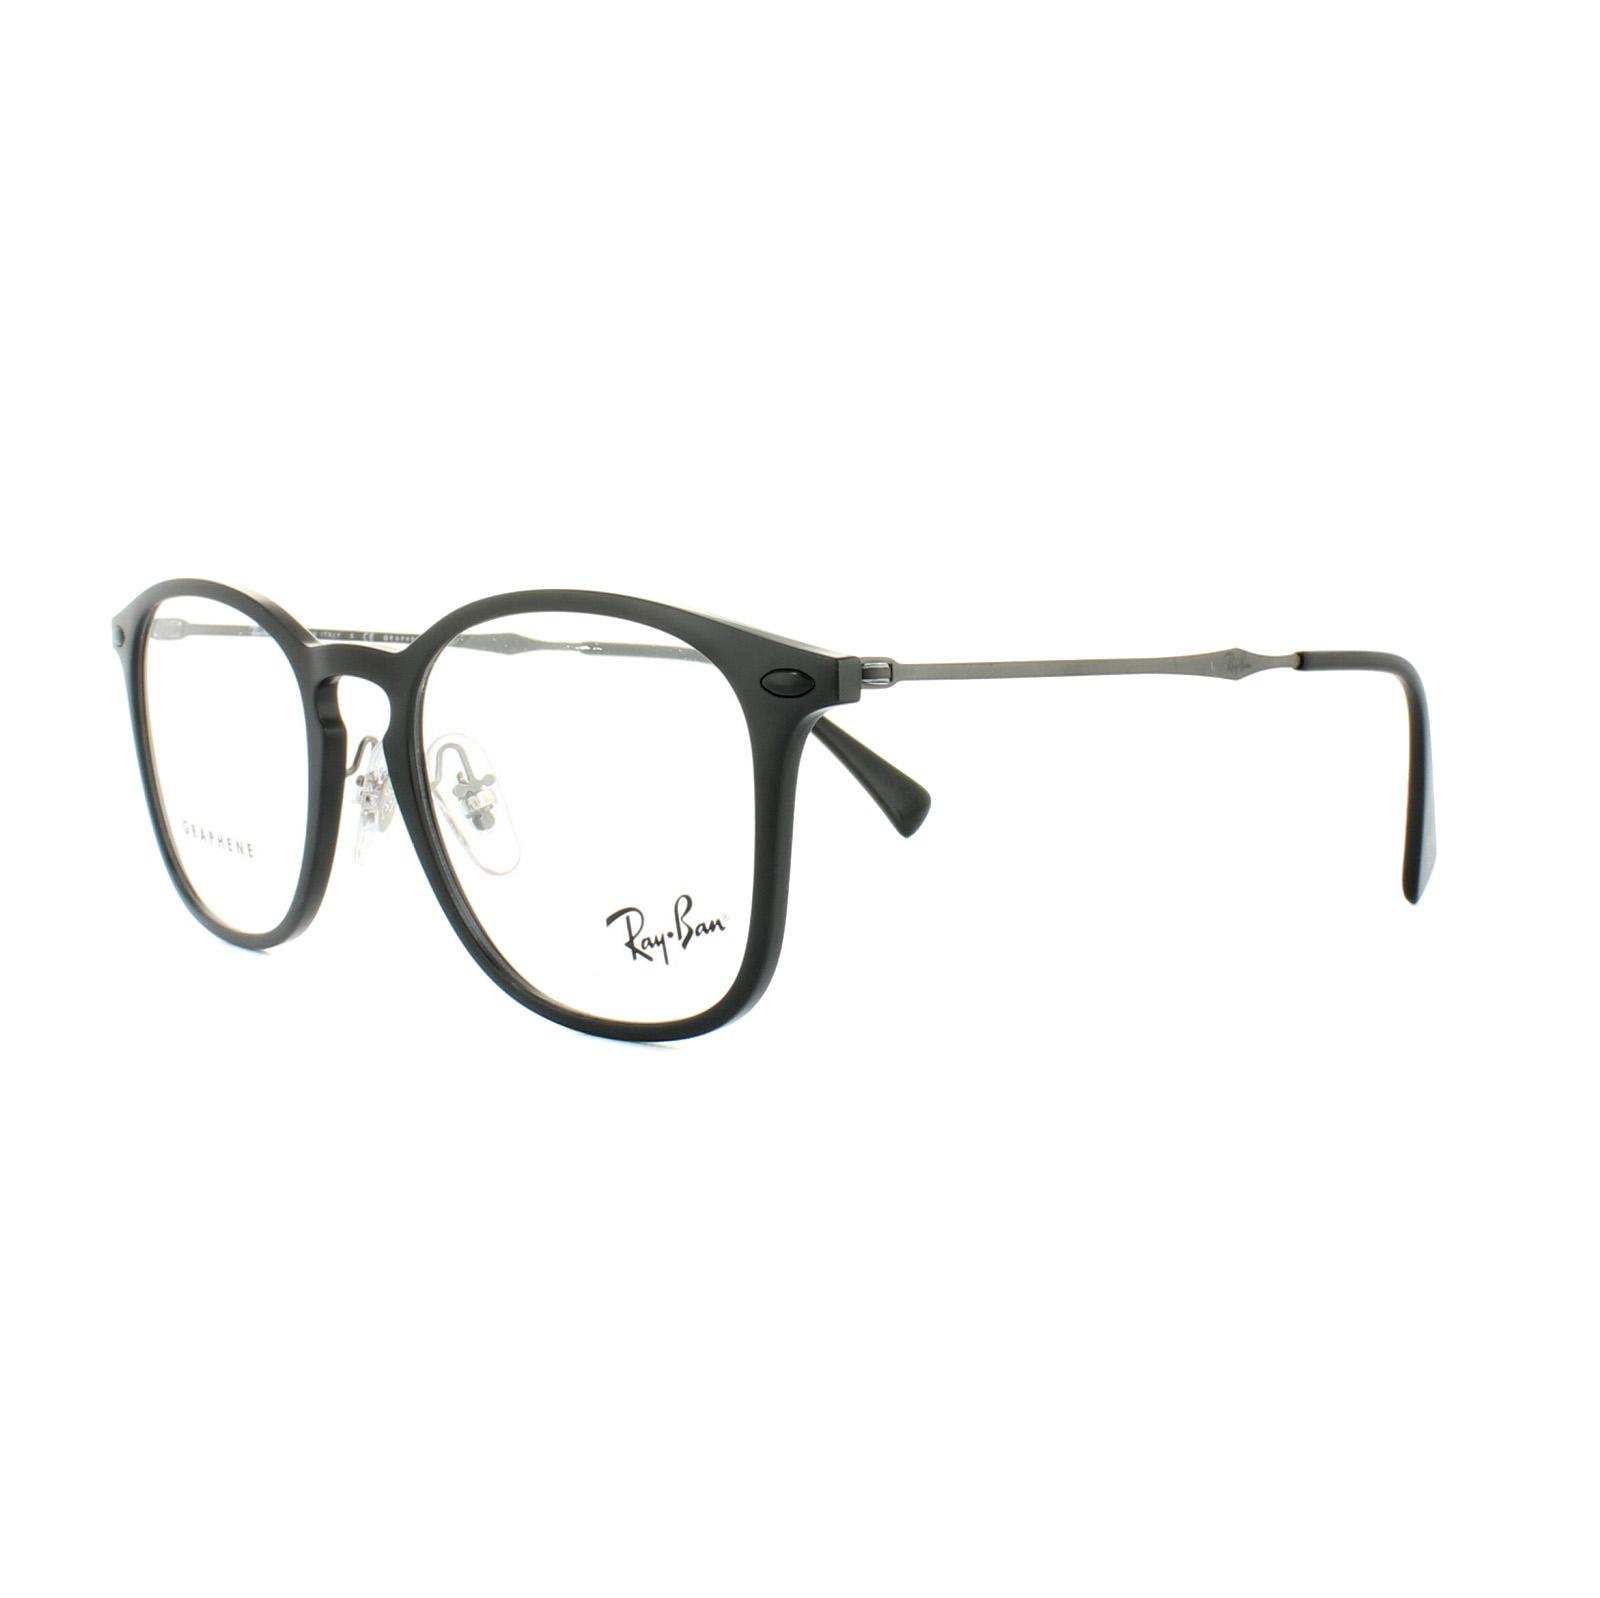 53185eaac0 Sentinel Ray-Ban Glasses Frames RX 8954 8025 Black Graphene Mens 50mm